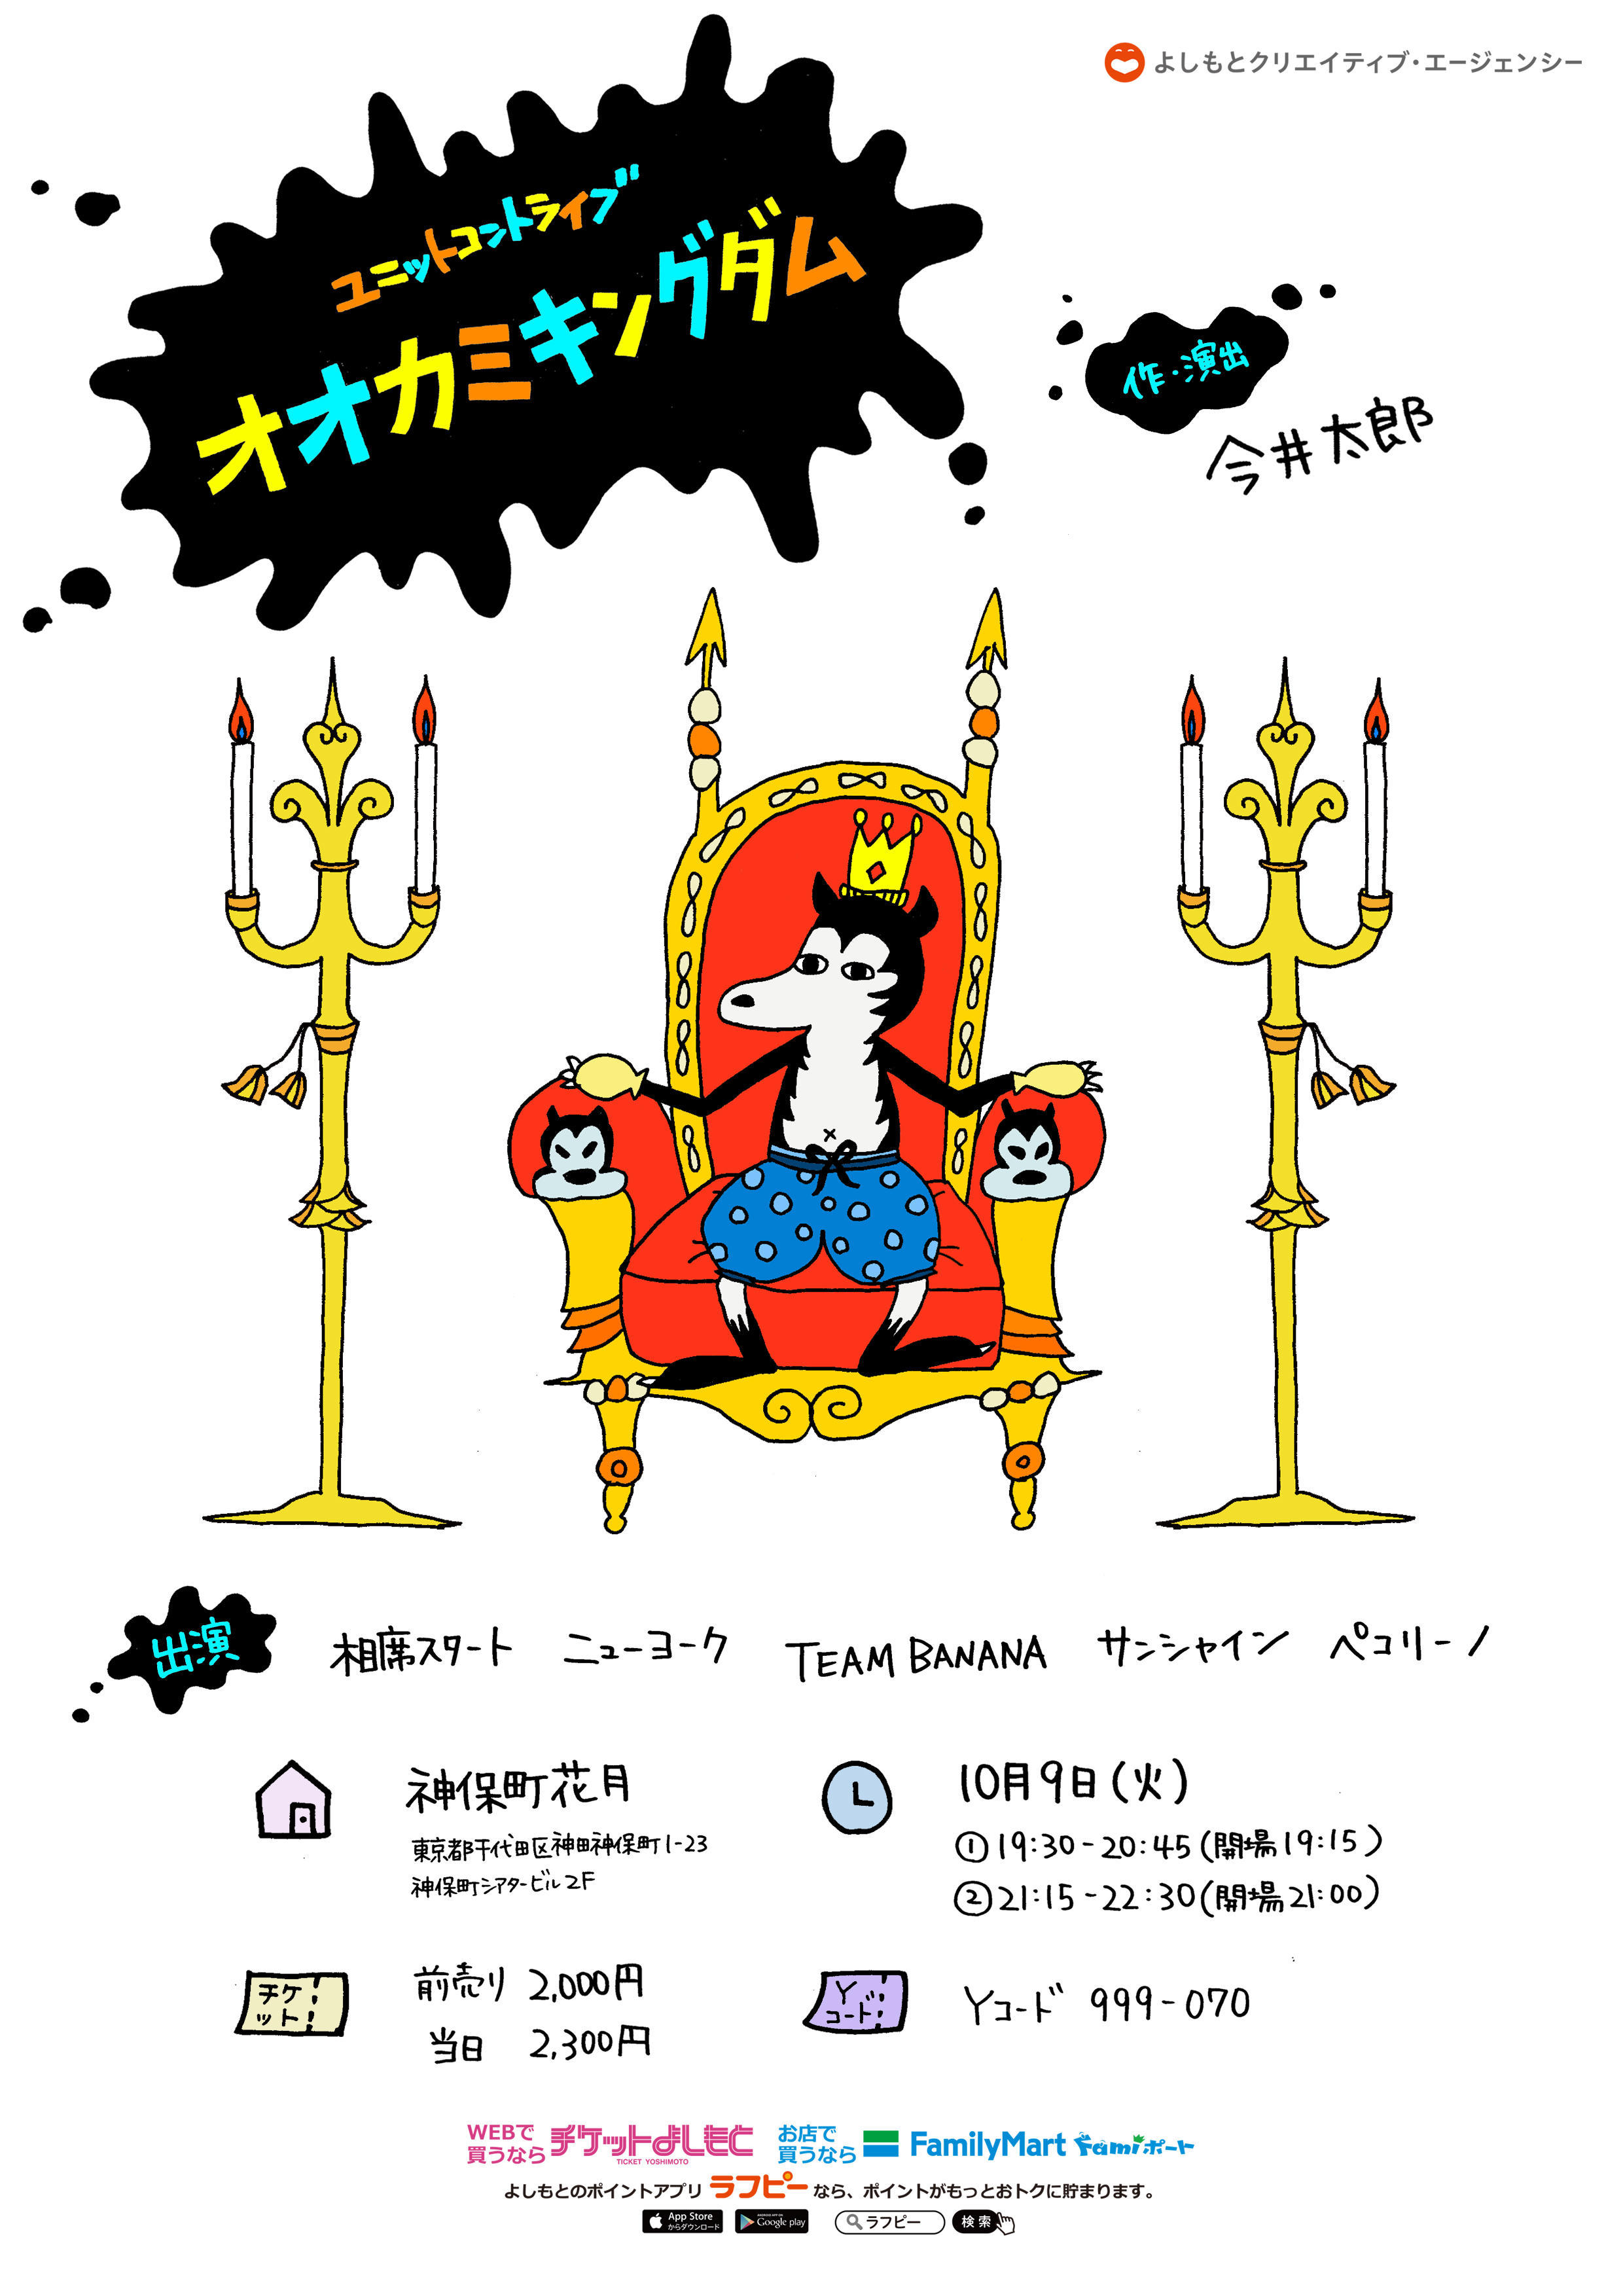 http://news.yoshimoto.co.jp/20180913165447-4c57e0e8abee54b8aa634e0c826ba30b4cec6305.jpg